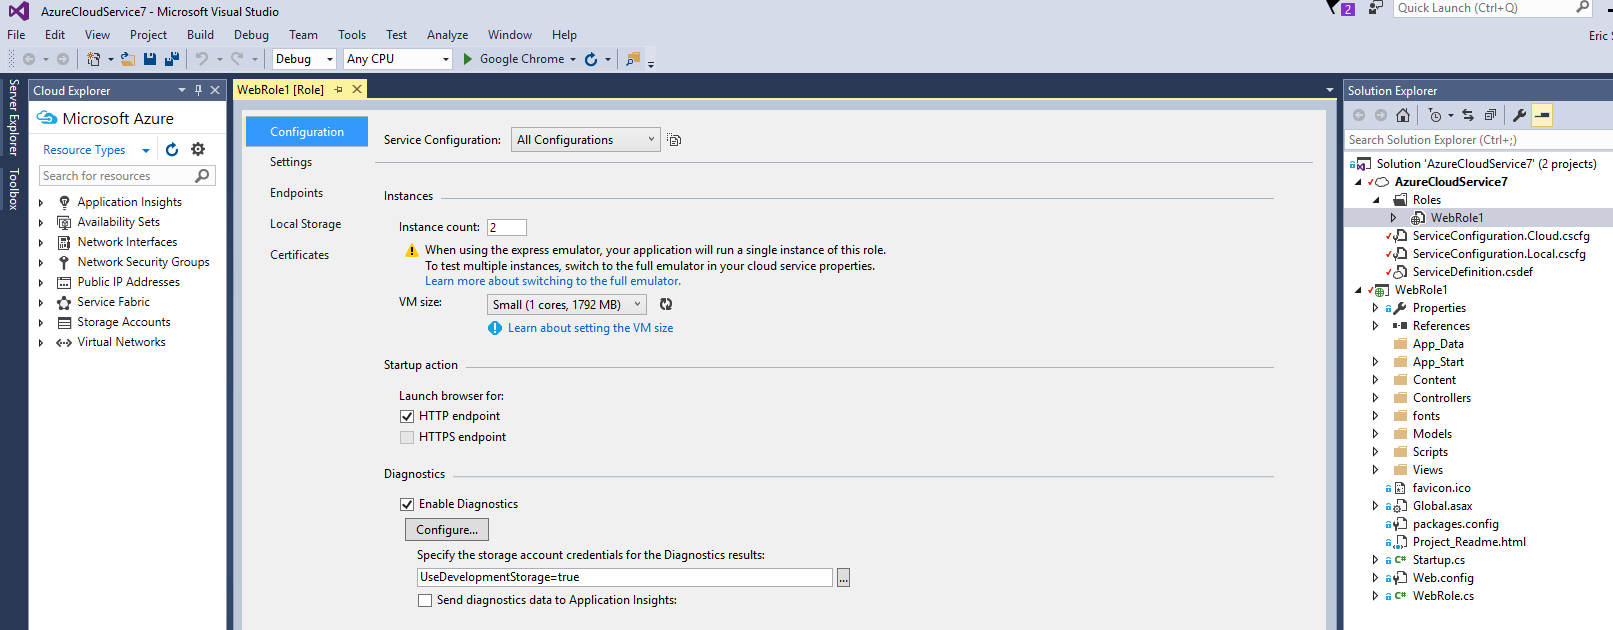 AzureCloudService4